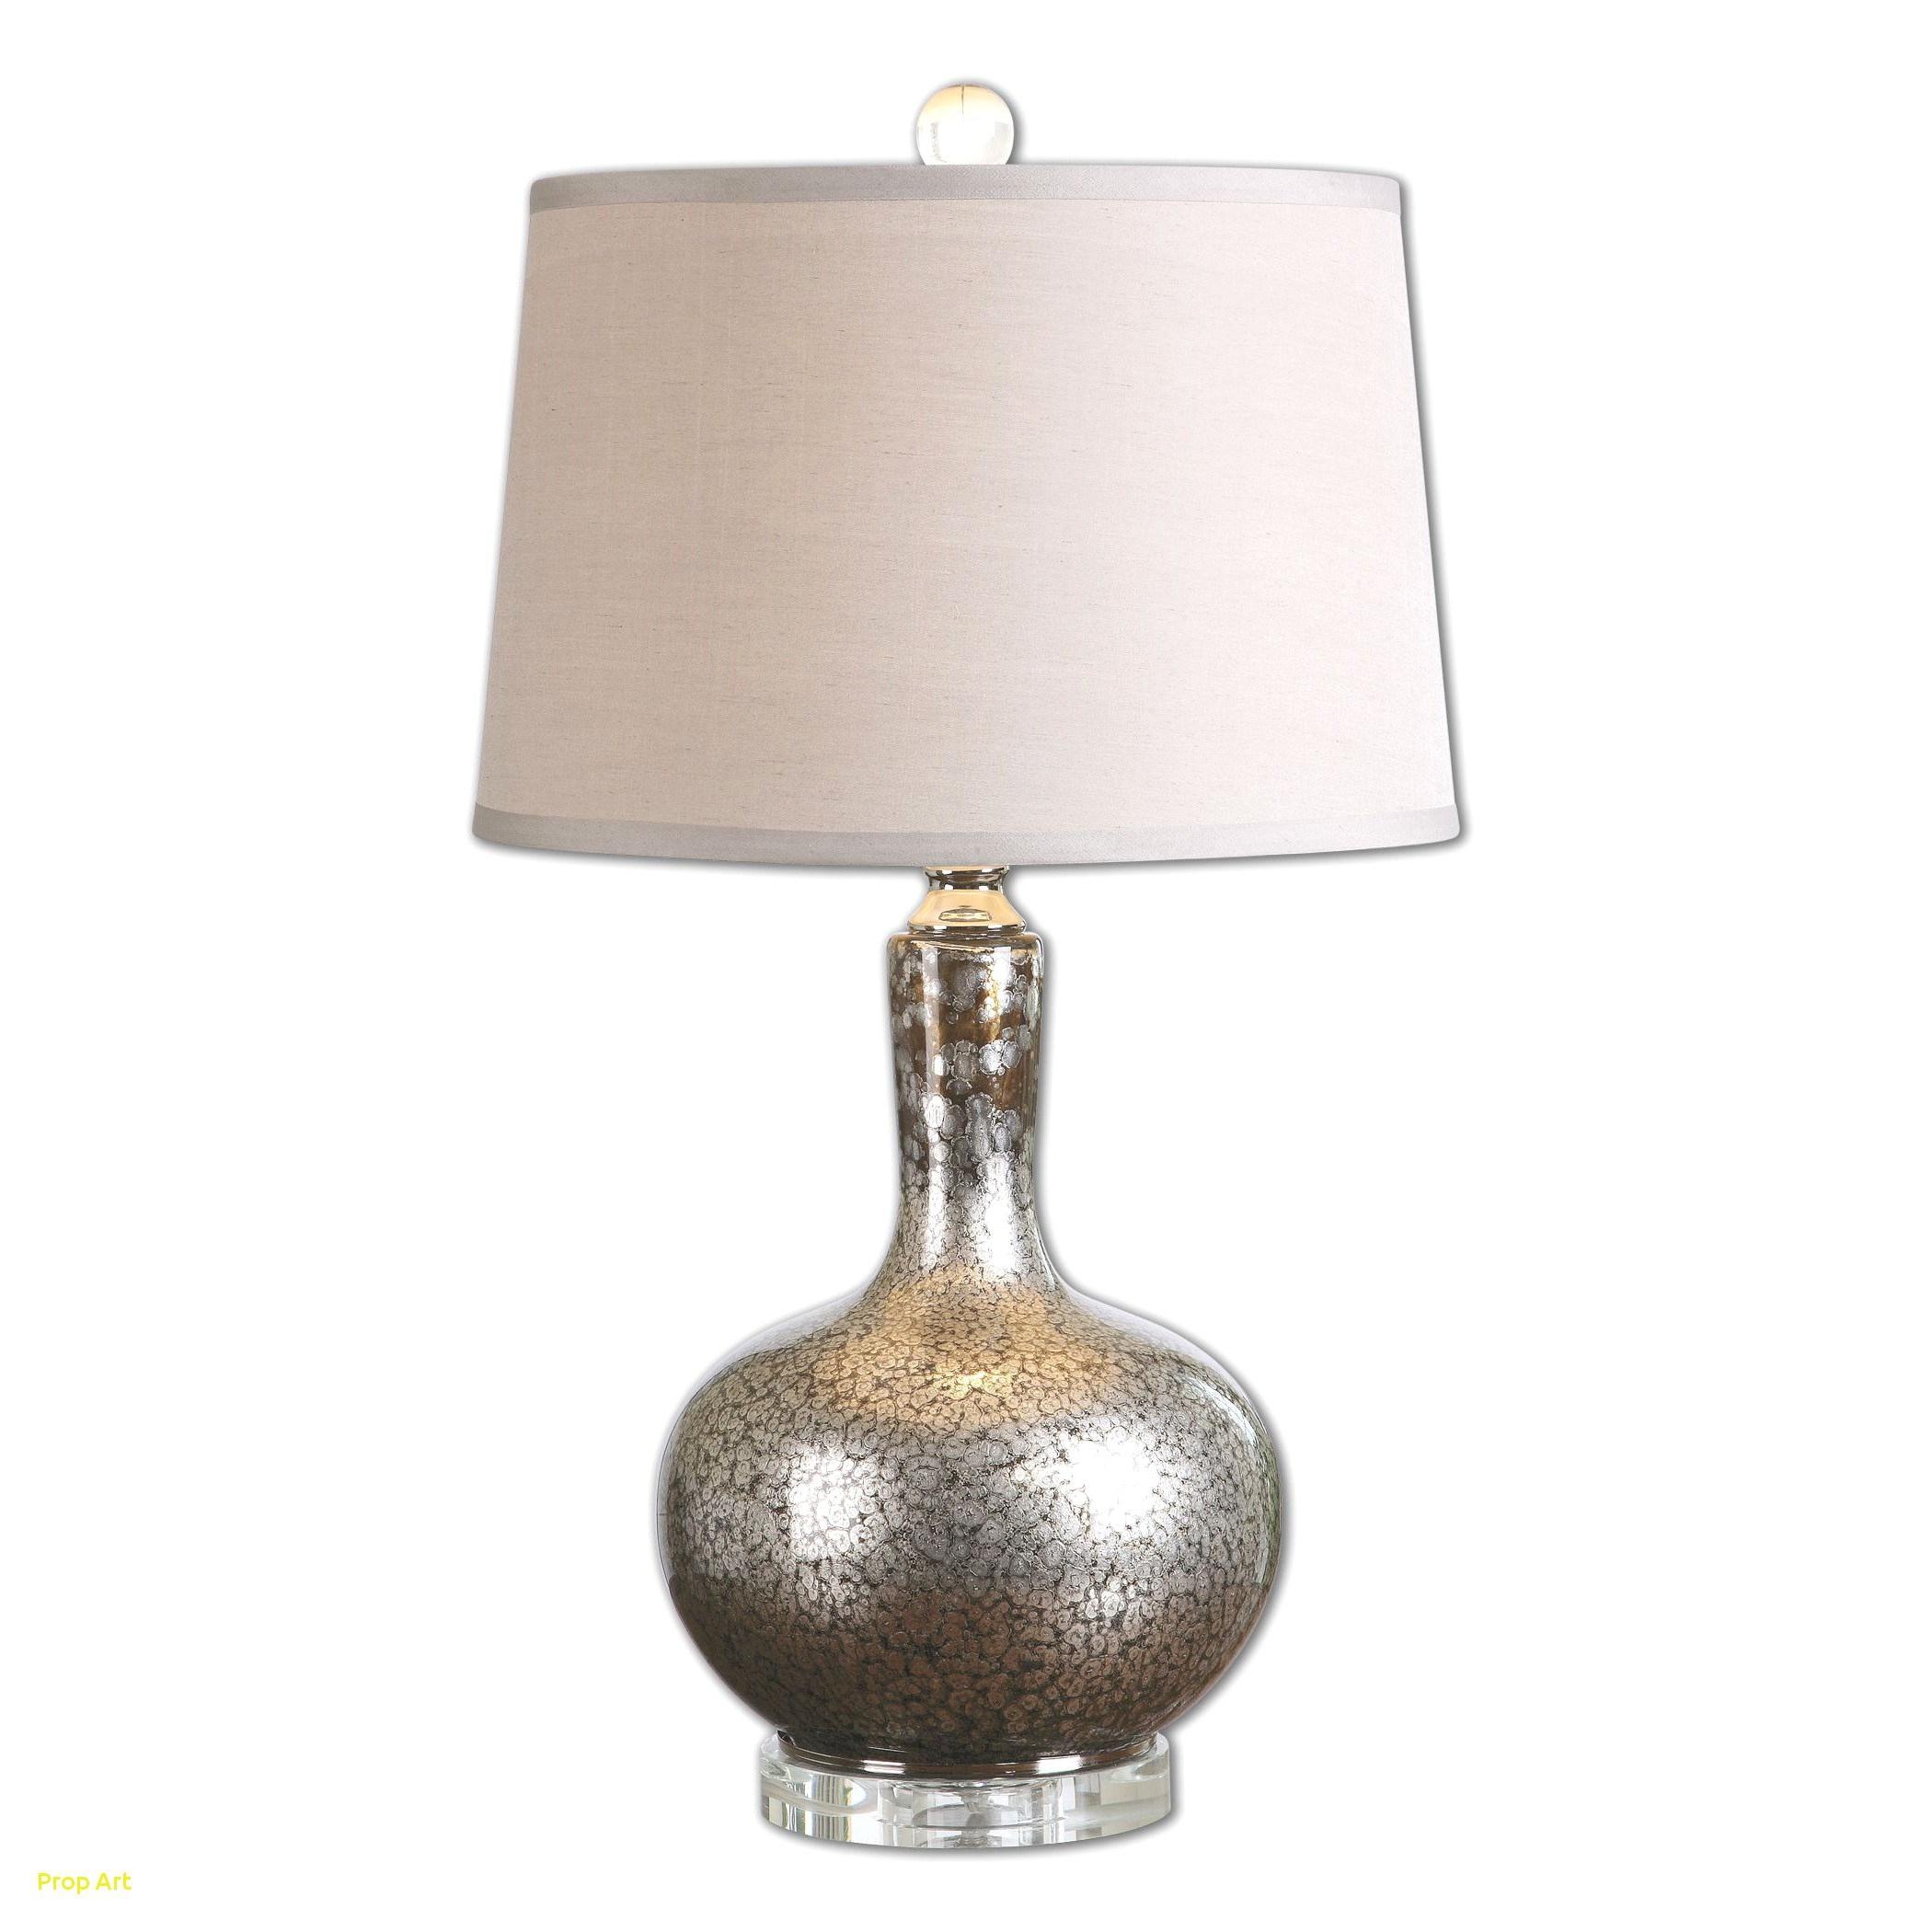 Bed Bath and Beyond Black Lamp Shades Bedroom Lamp Shades athomeforhire Com